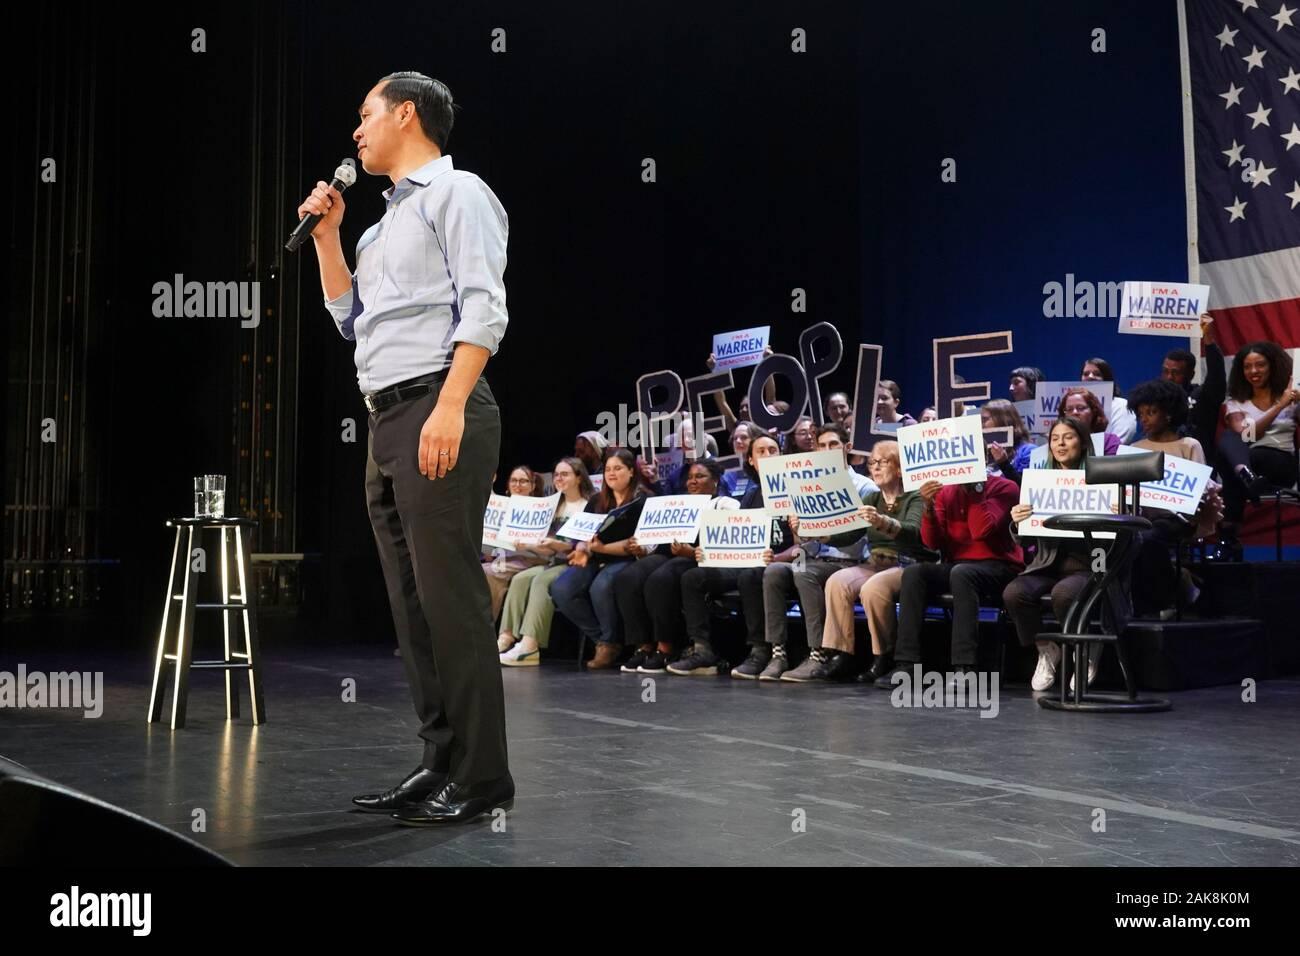 NEW YORK, NY - JANUARY 07: Former HUD Secretary Julian Castro speaks during presidential candidate Senator Elizabeth Warren campaign event at Kings Th Stock Photo